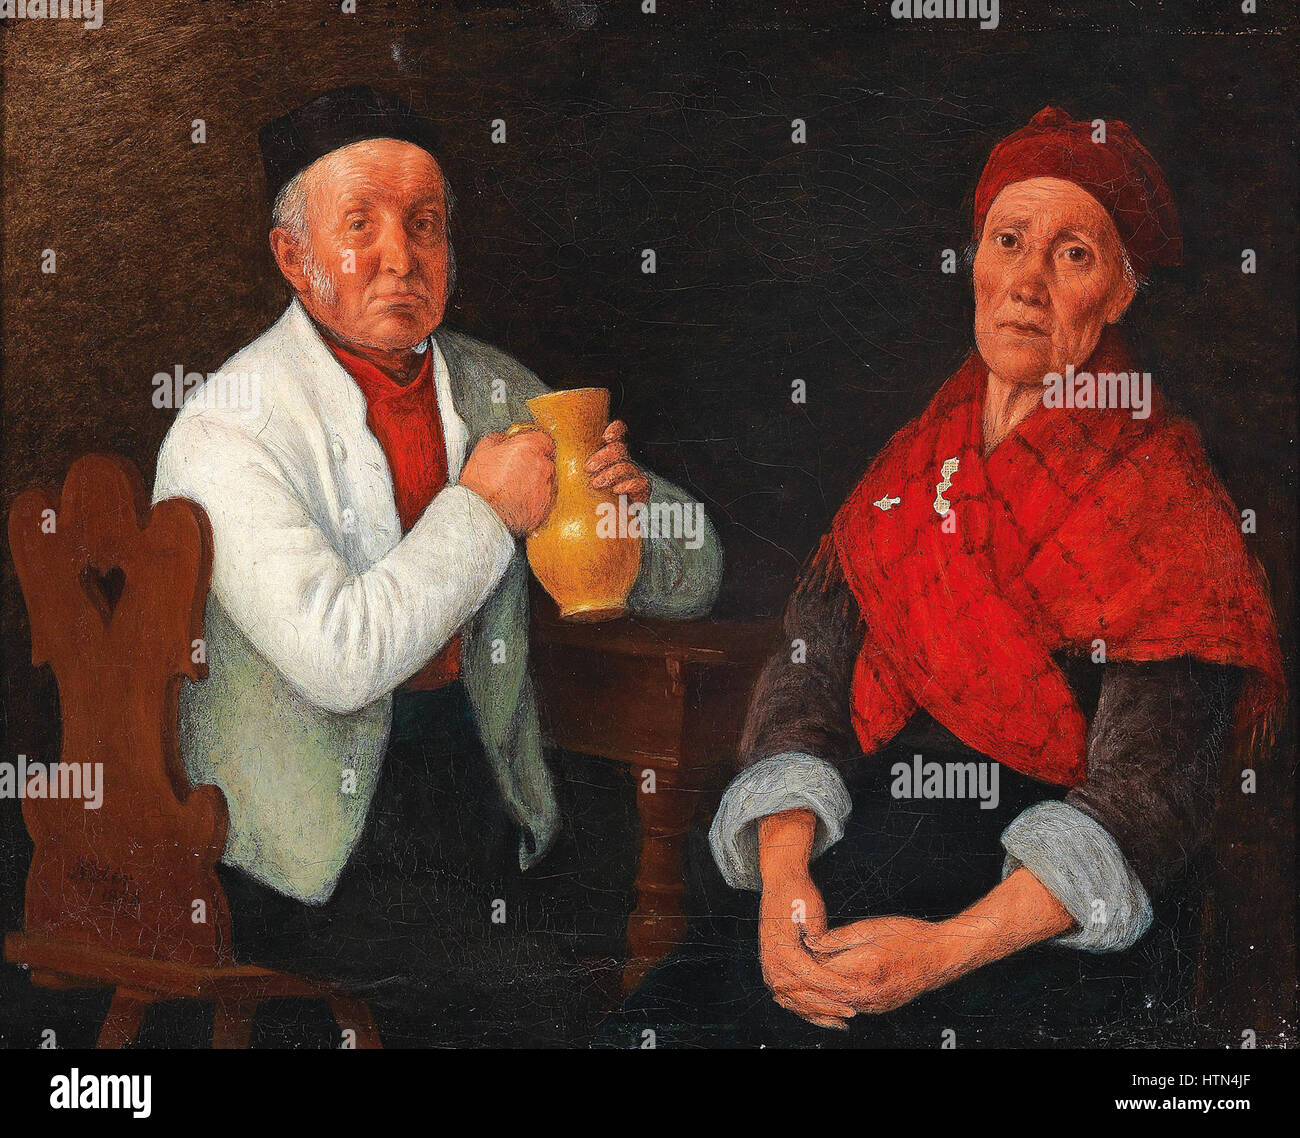 Michael Neder Sitzendes Paar 1858 - Stock Image